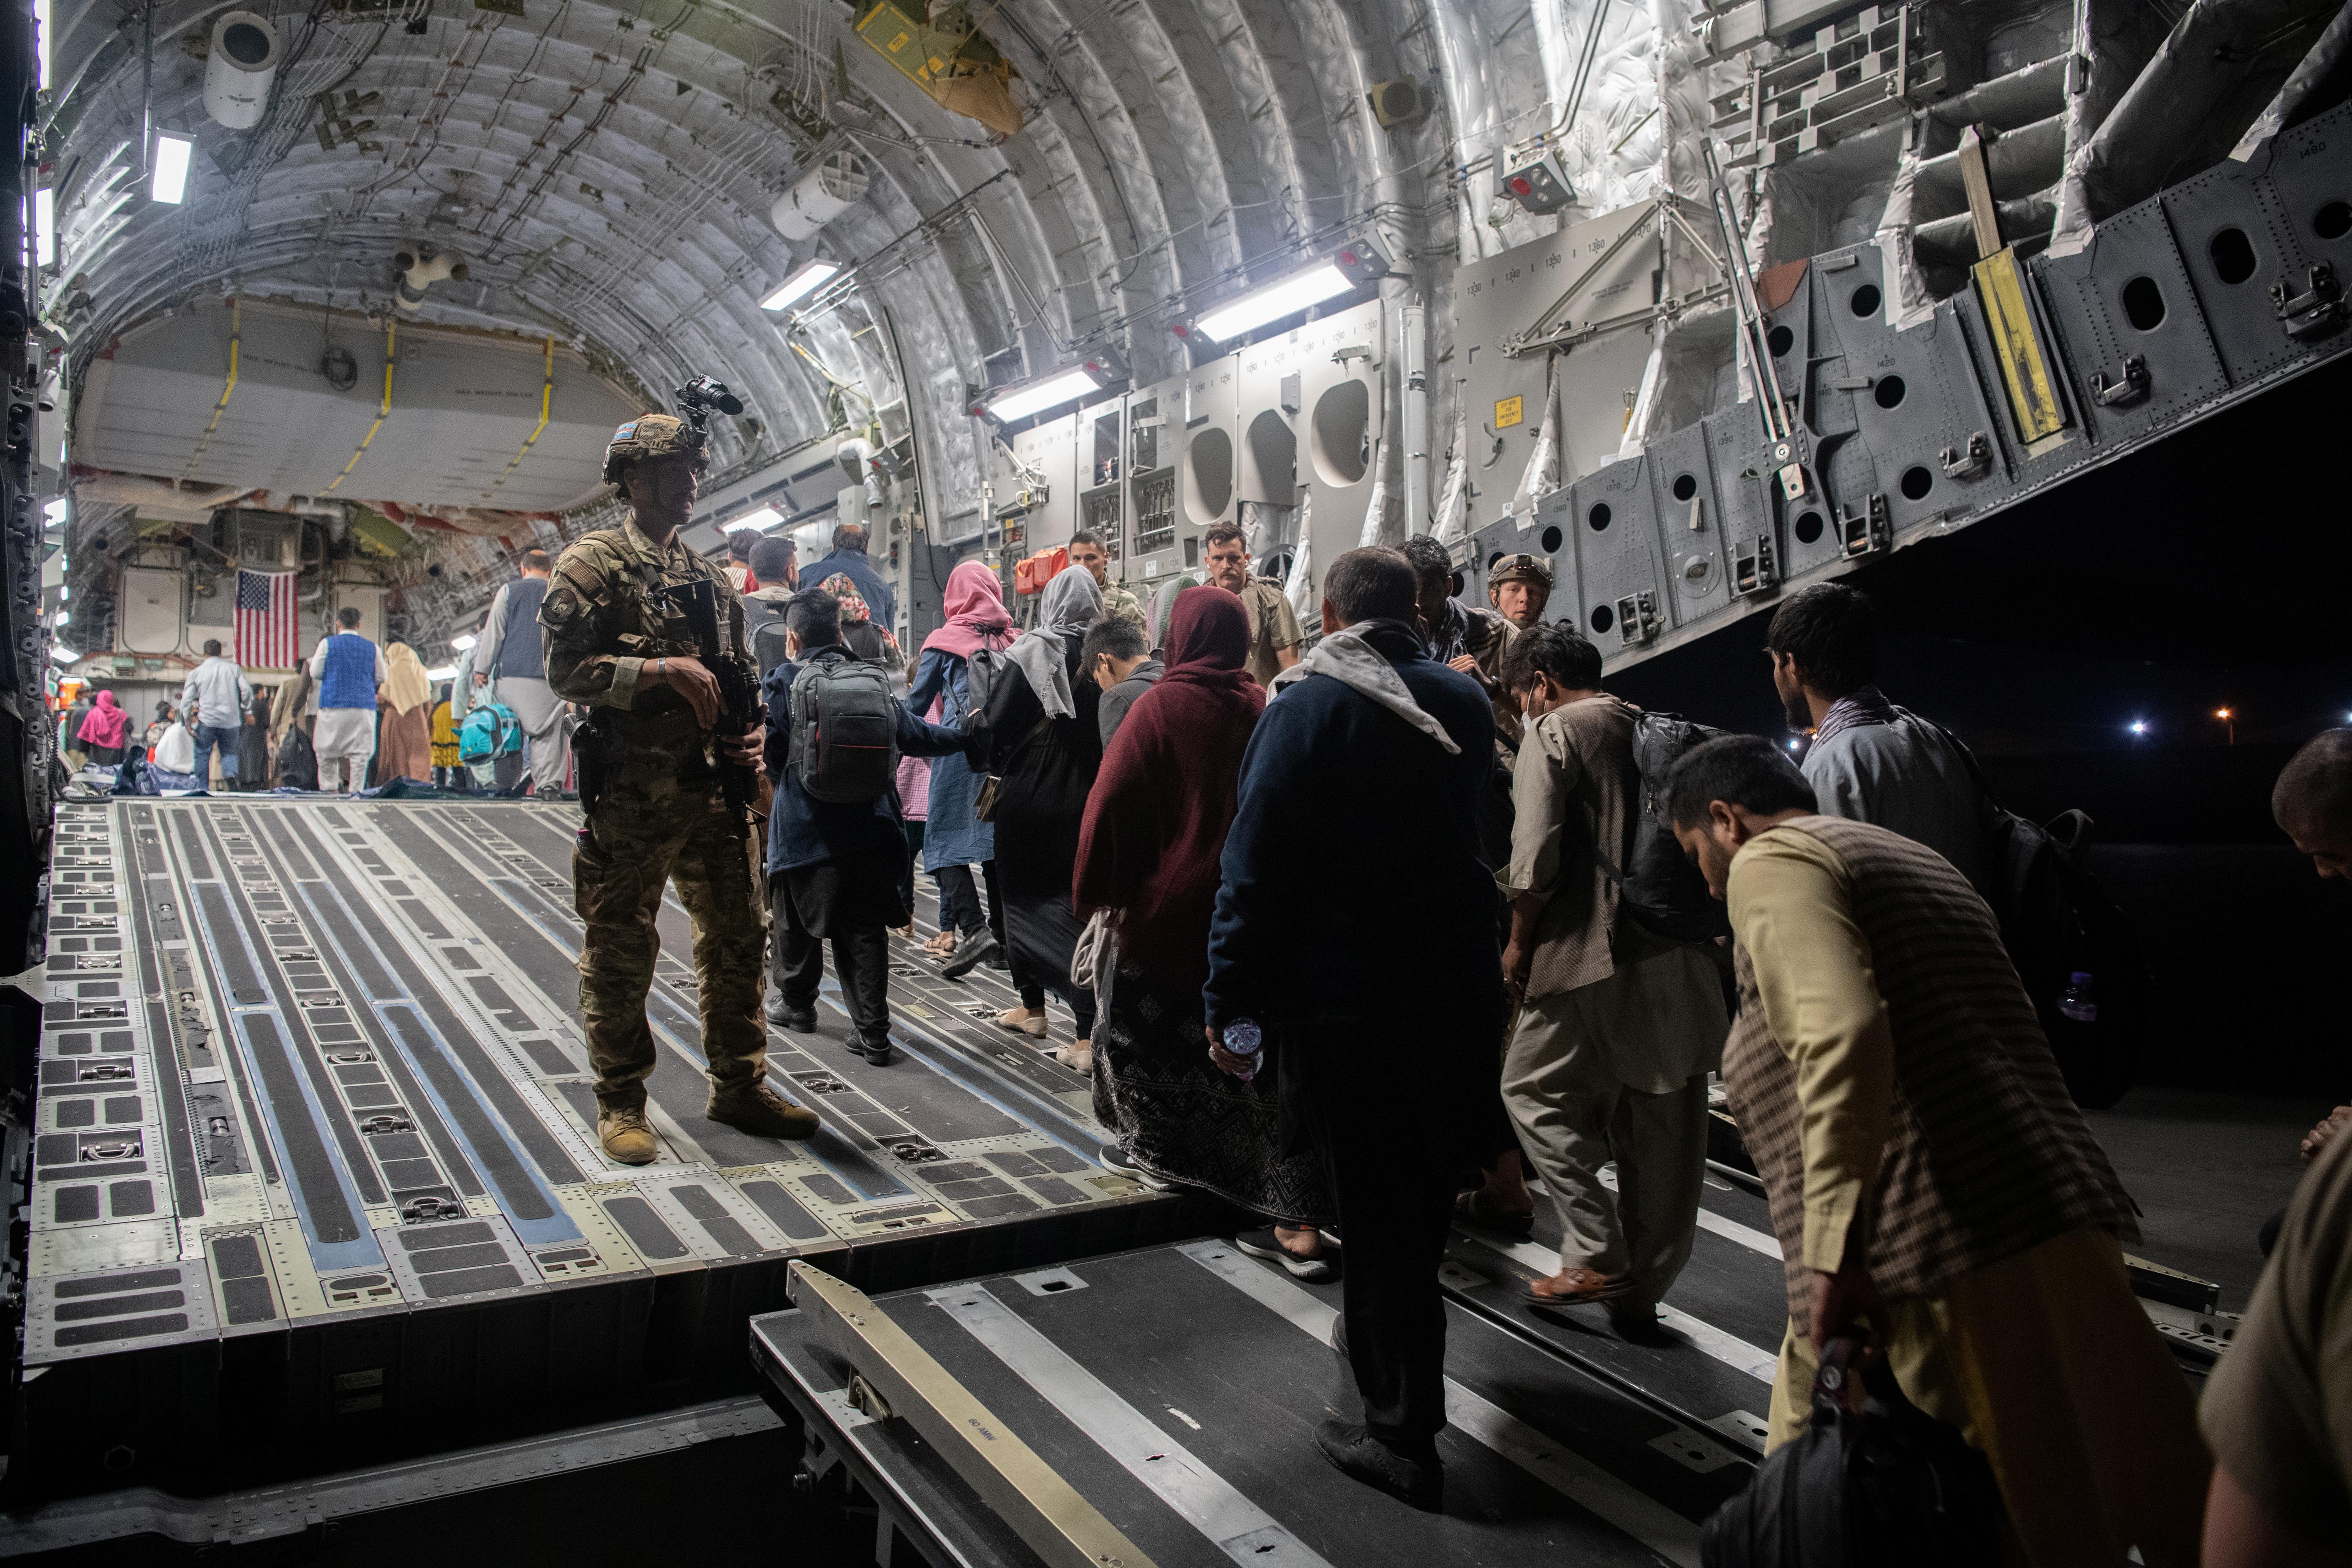 Afghans board a U.S. Air Force C-17 Globemaster III transport plane during an evacuation at Hamid Karzai International Airport, Afghanistan, August 22, 2021. U.S. Air Force/Handout via REUTERS